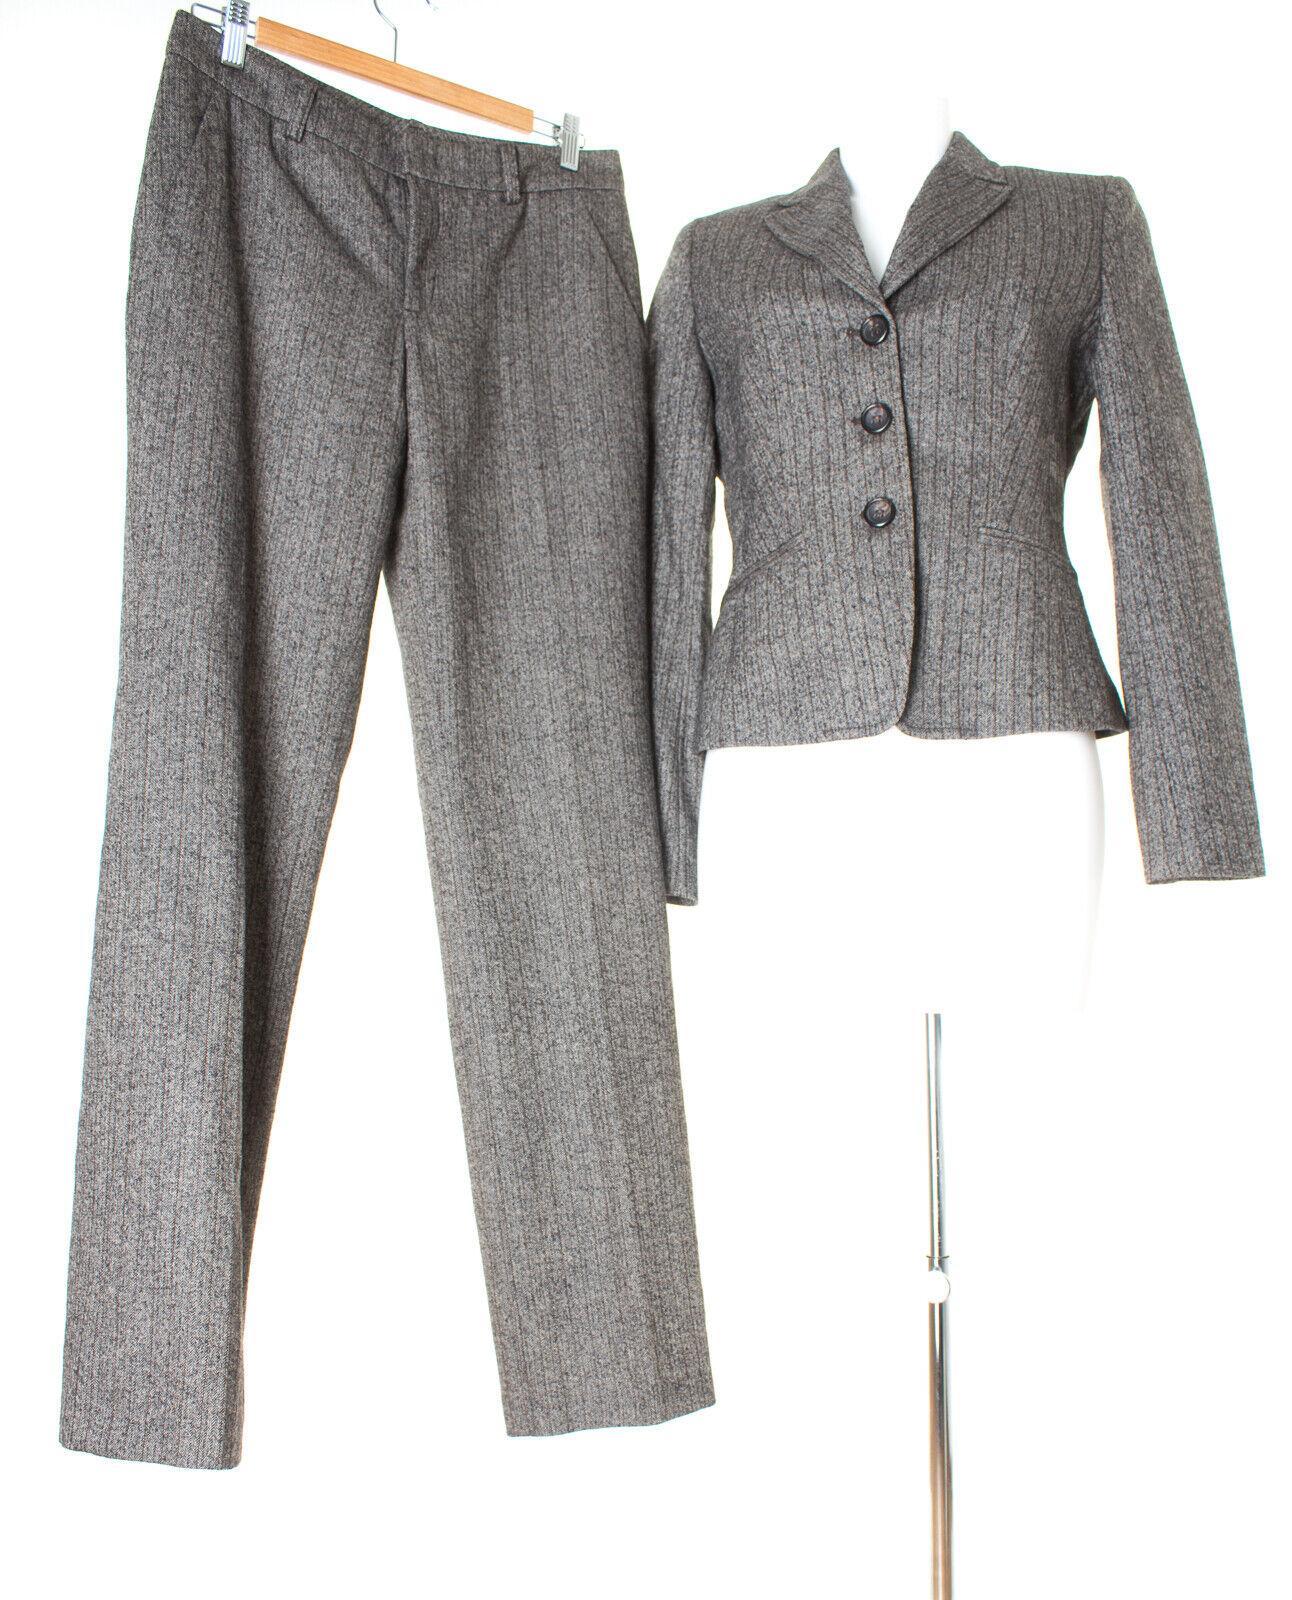 4819d0c26ef3 Marc O  Polo  Polo  Polo Pantaloni vestito pantaloni Giacca Lana Donna Tg.  de 38 Multicolore 1bbdf1